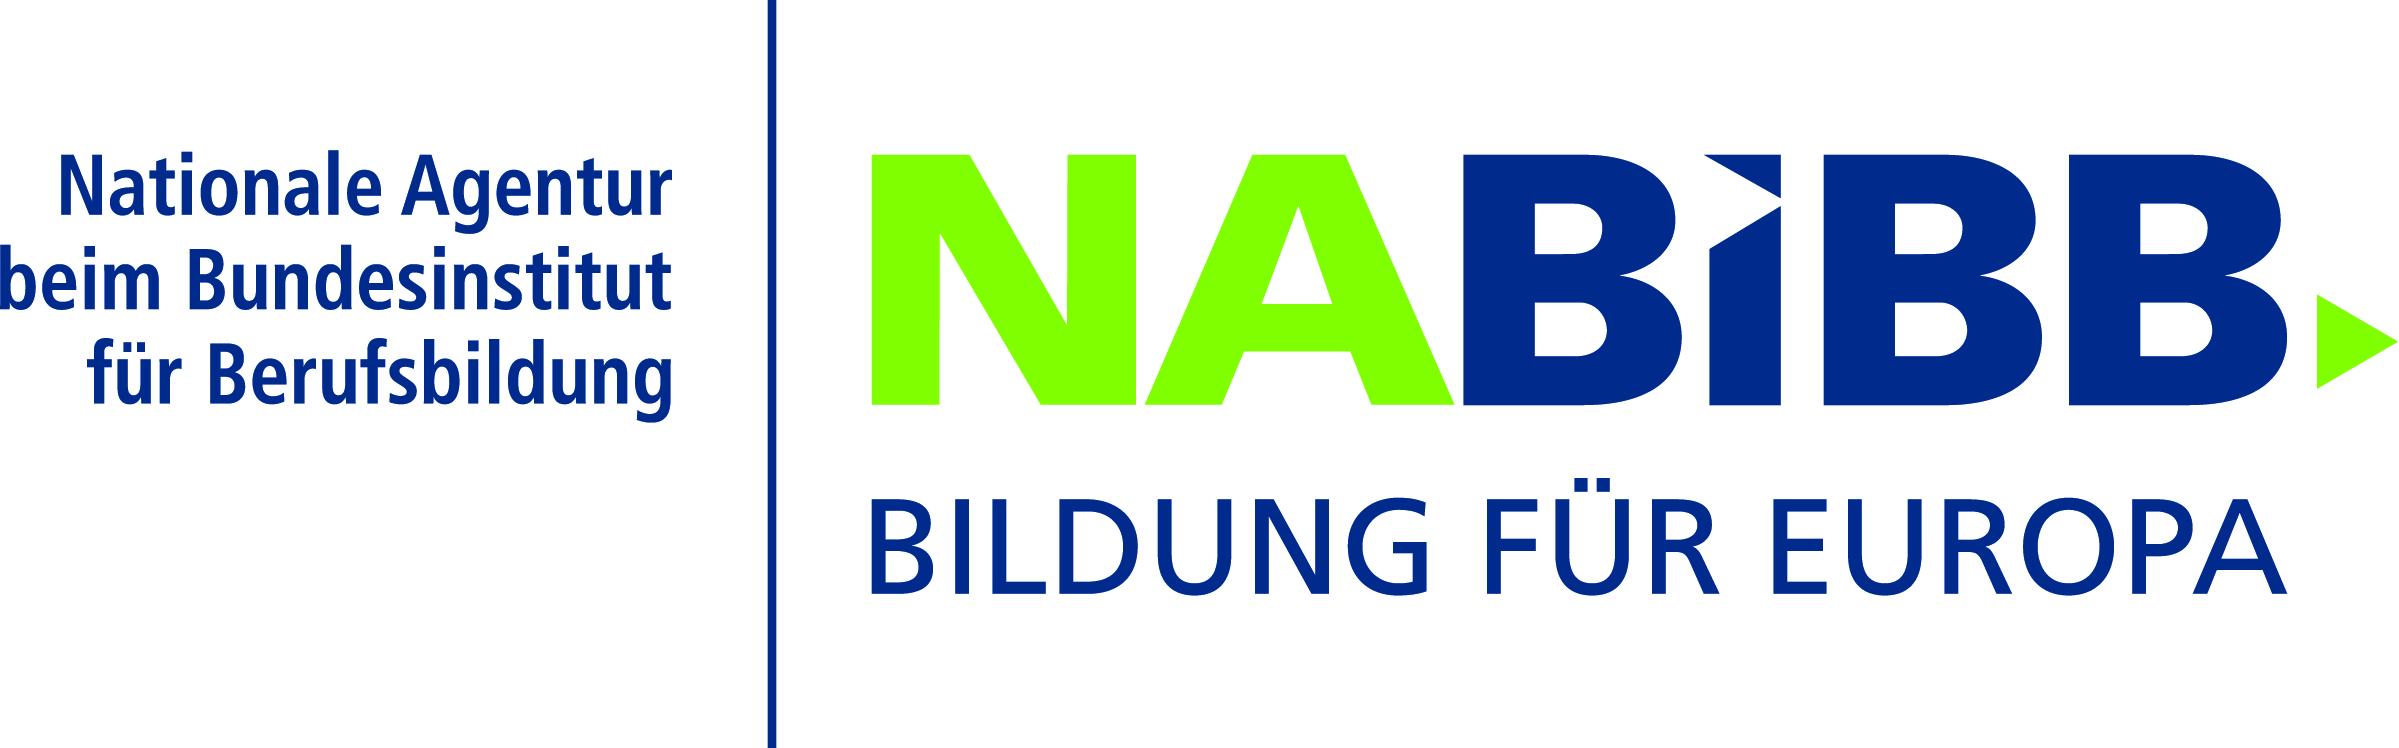 Logo/